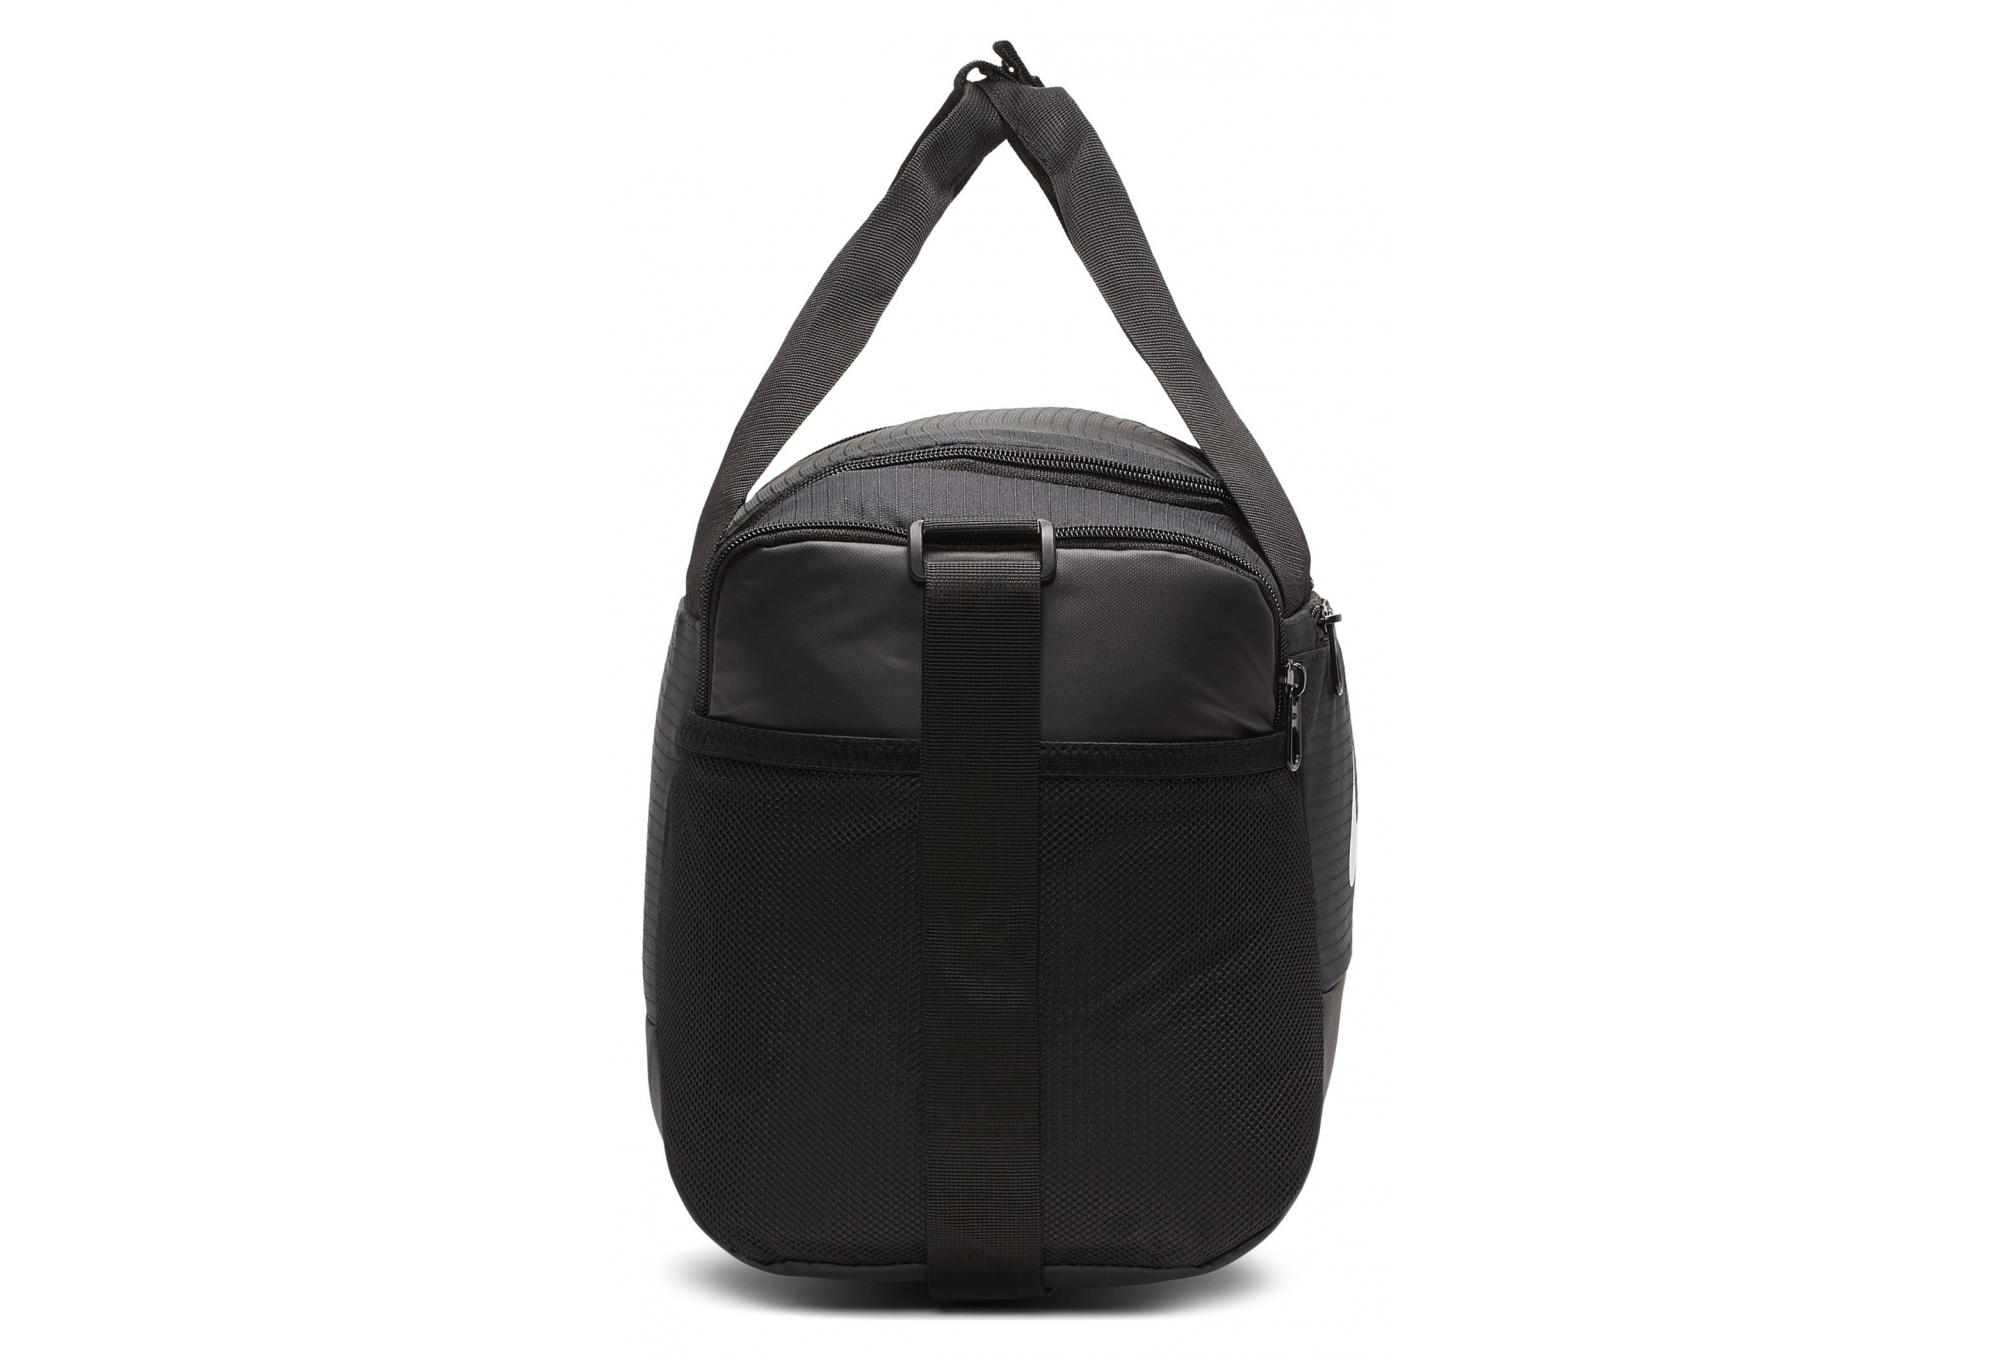 nike.xsmall noir sac